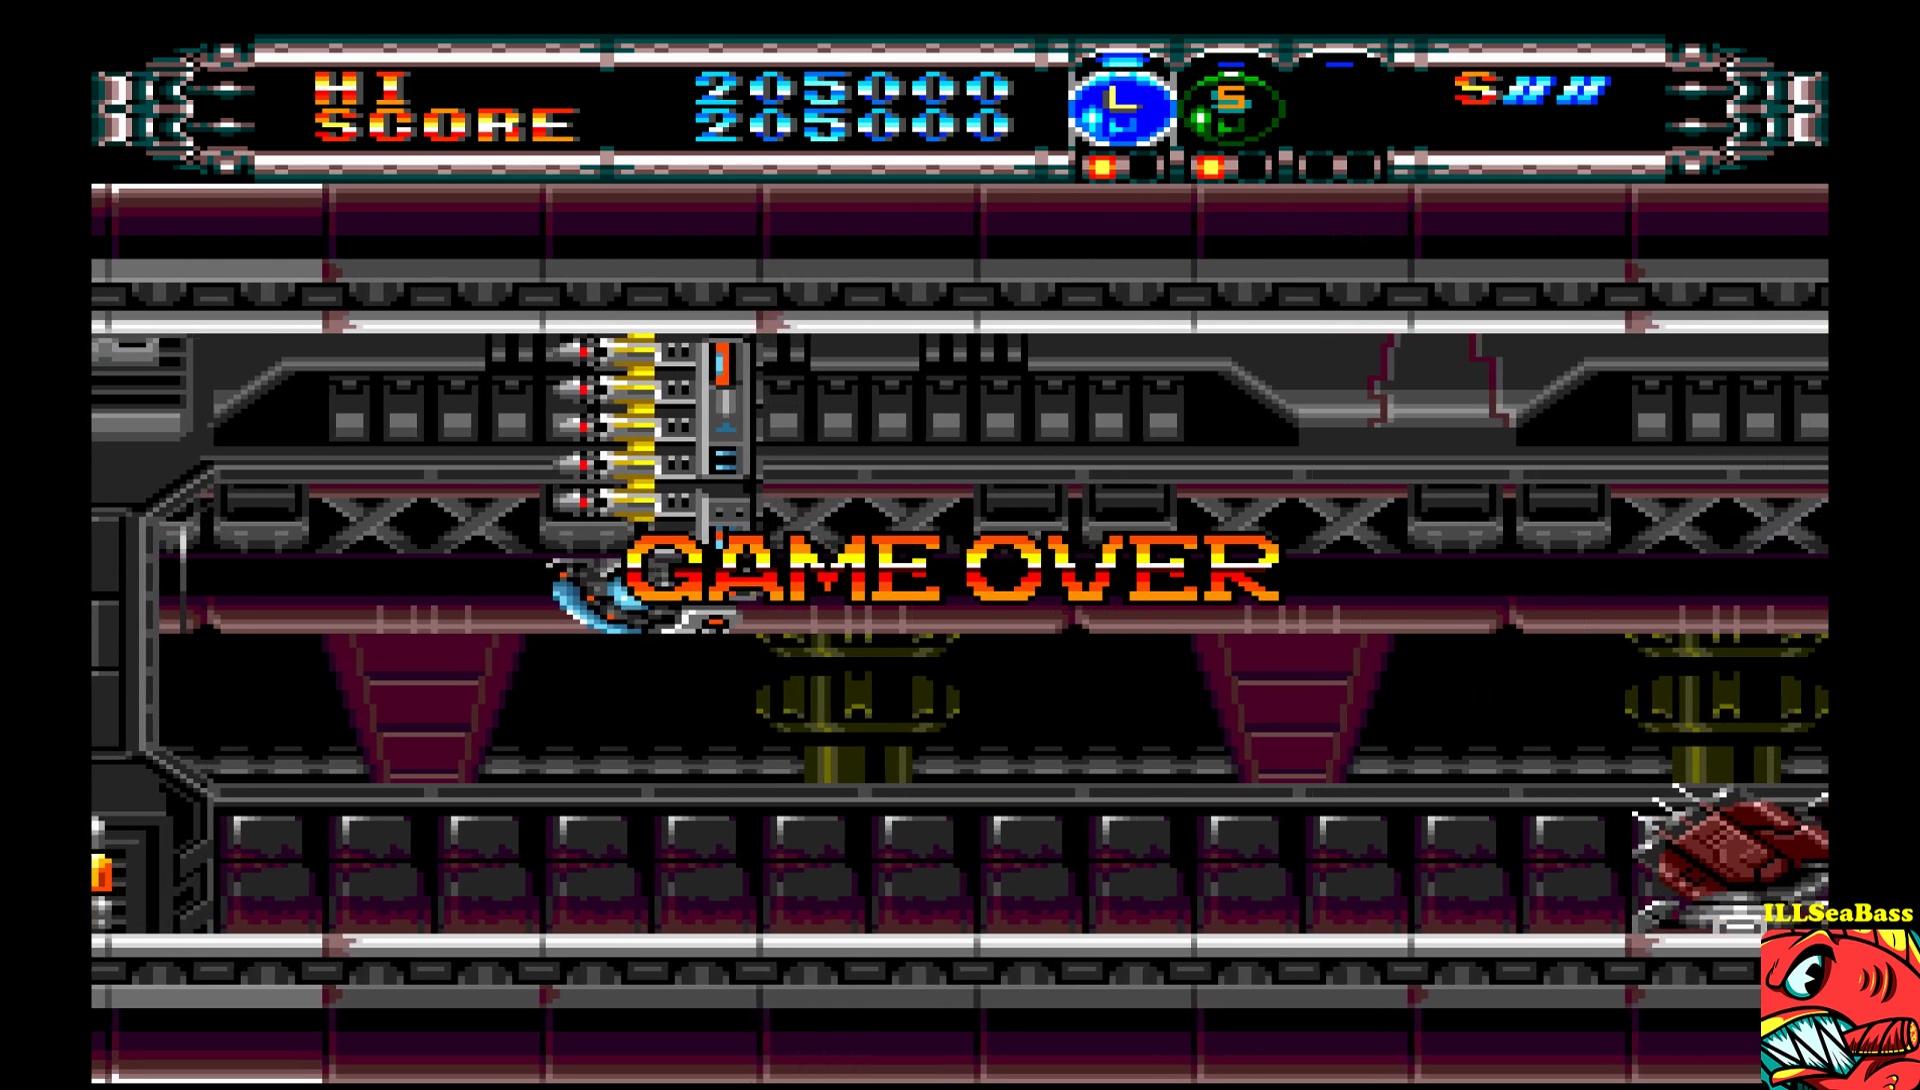 ILLSeaBass: Gate of Thunder (TurboGrafx-16/PC Engine Emulated) 205,000 points on 2017-02-01 22:05:53